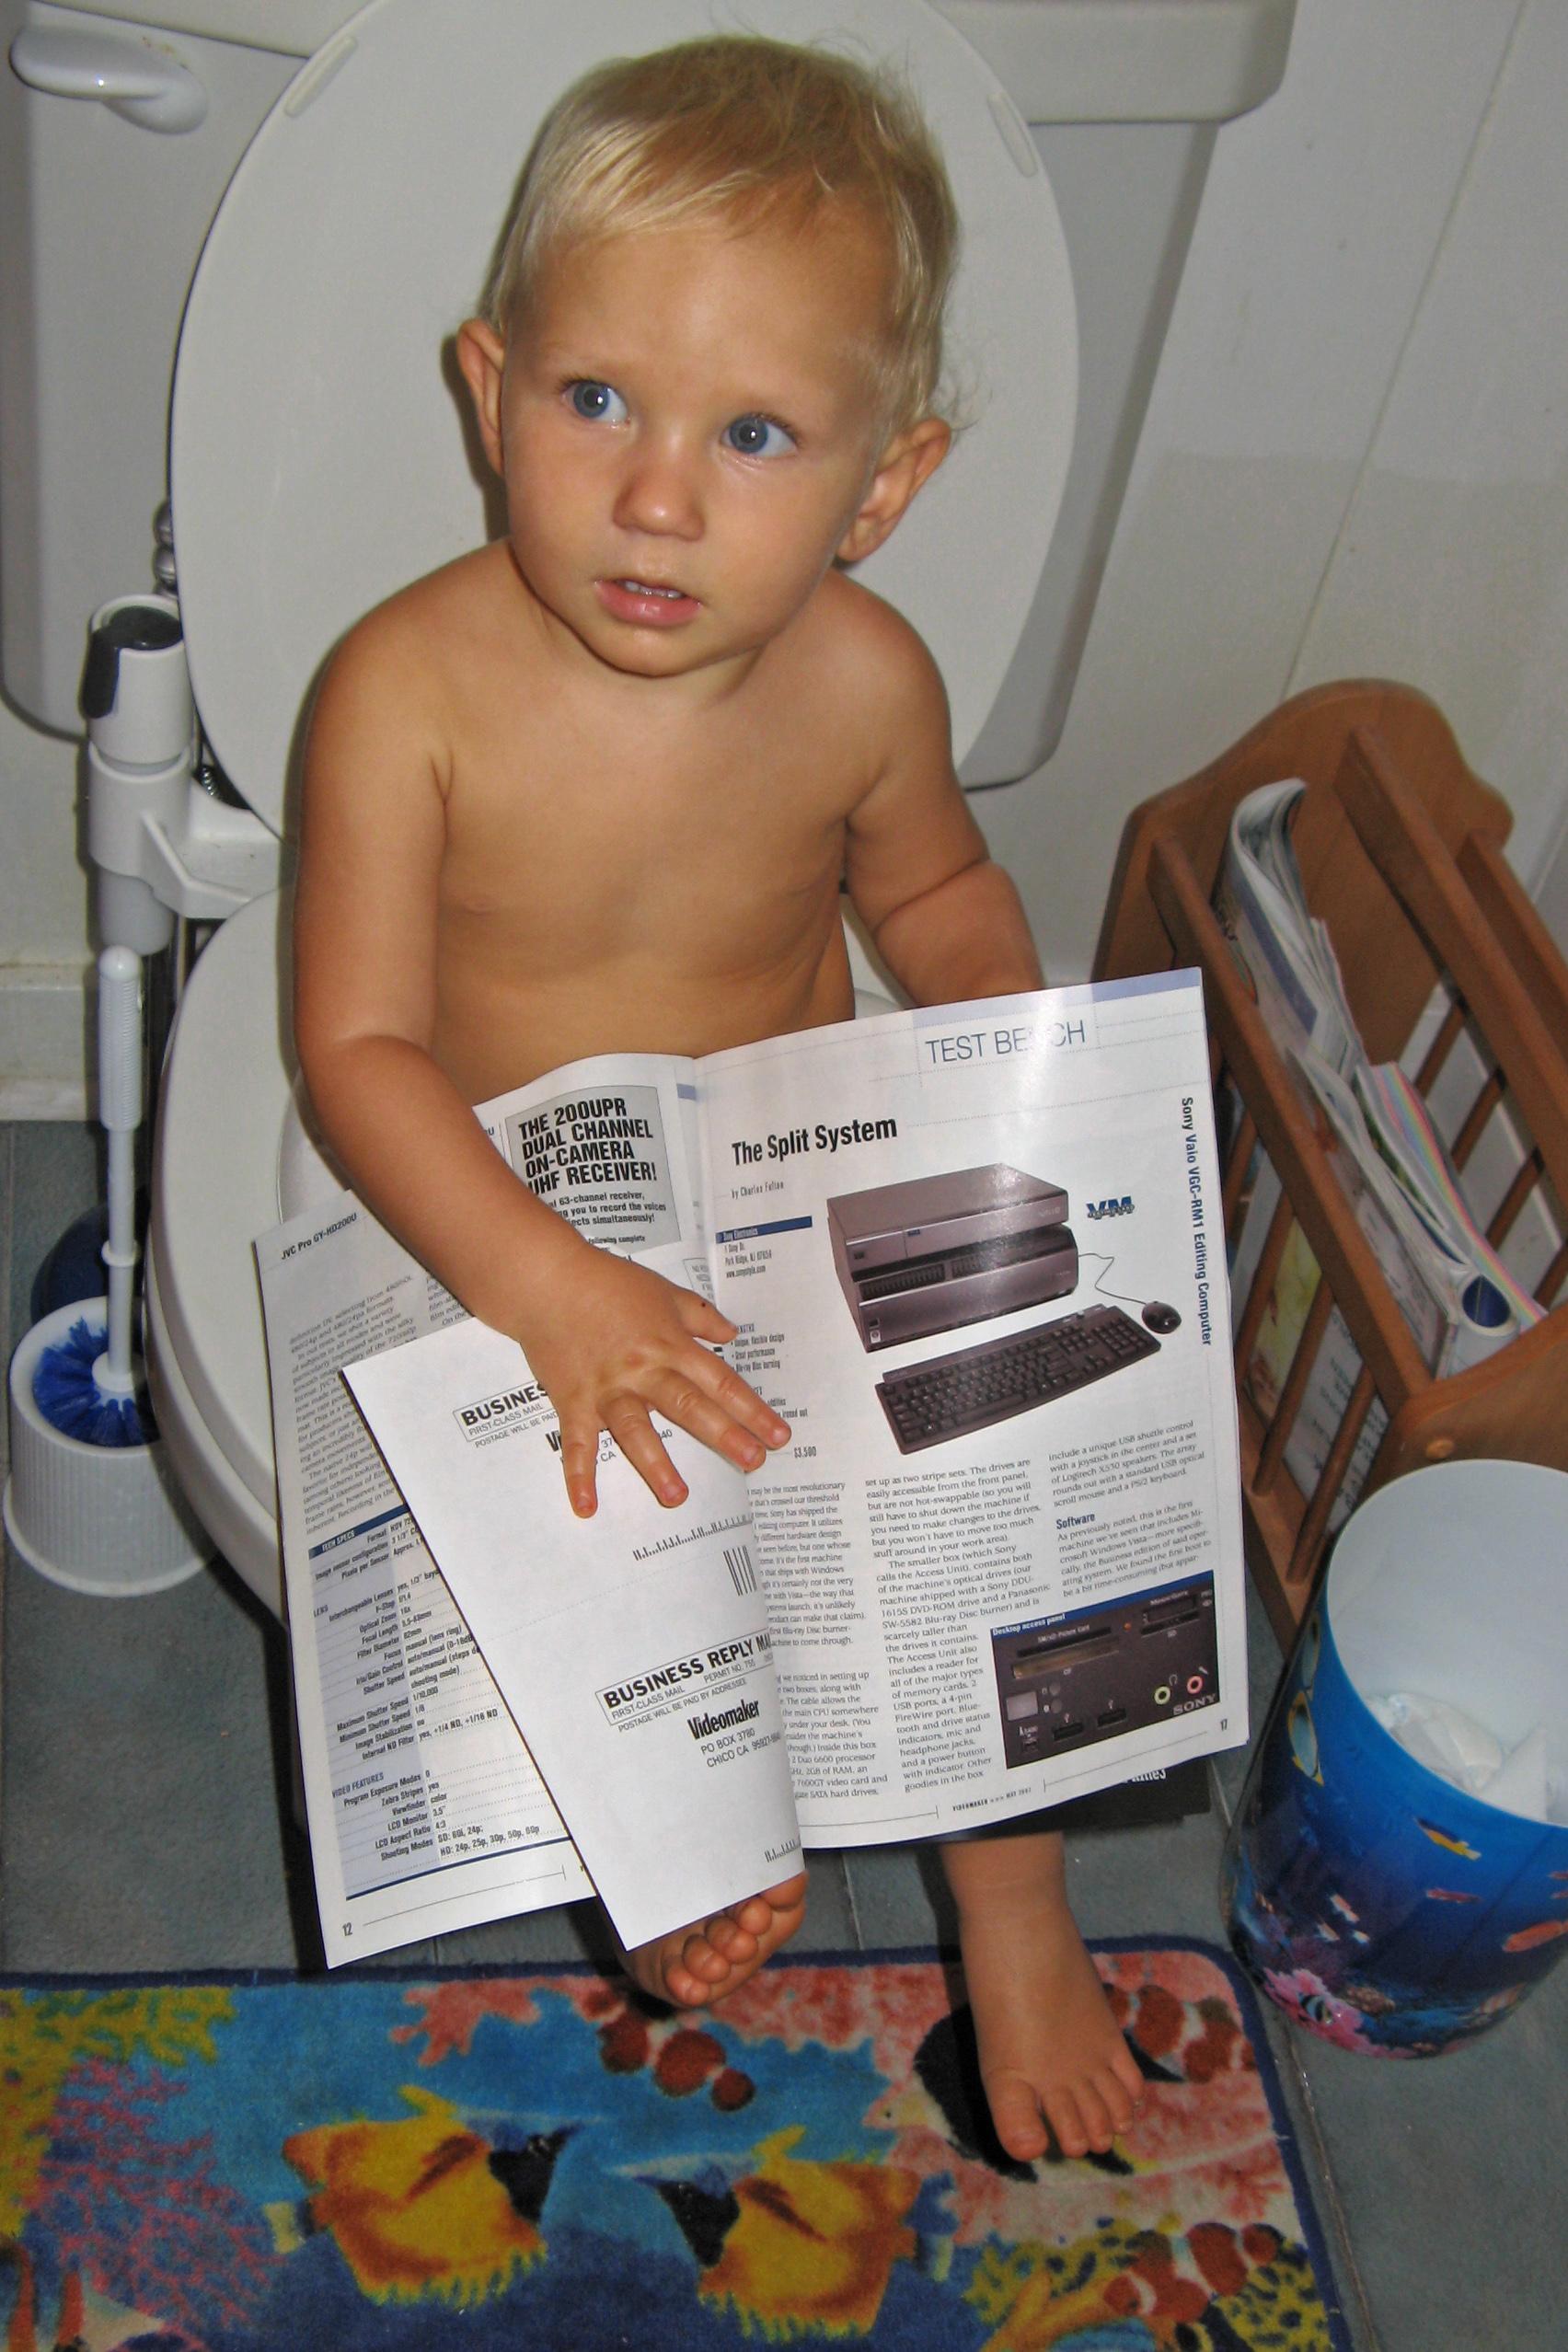 Blog toilet nude